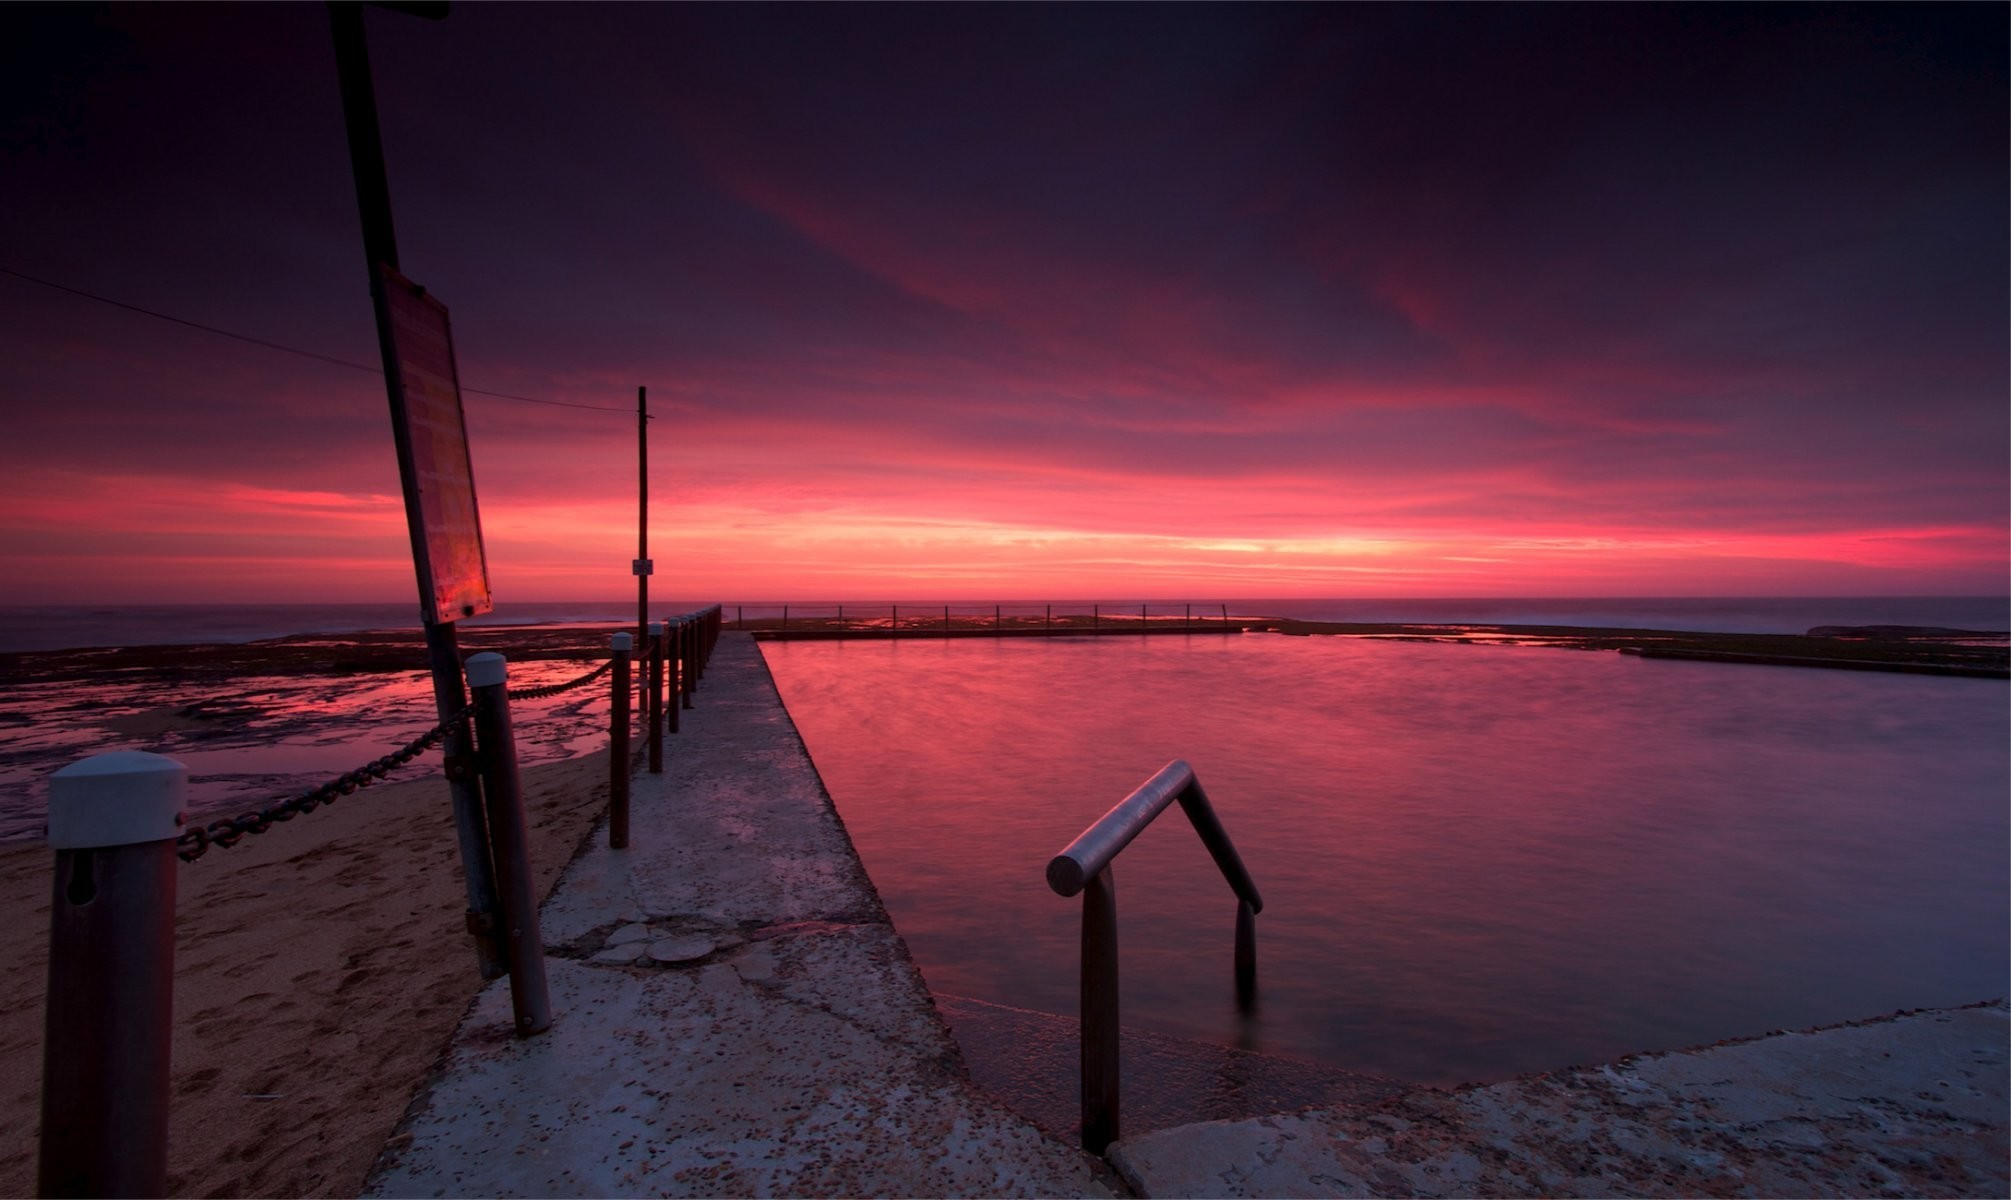 australia beach night twilight sunset sky clouds